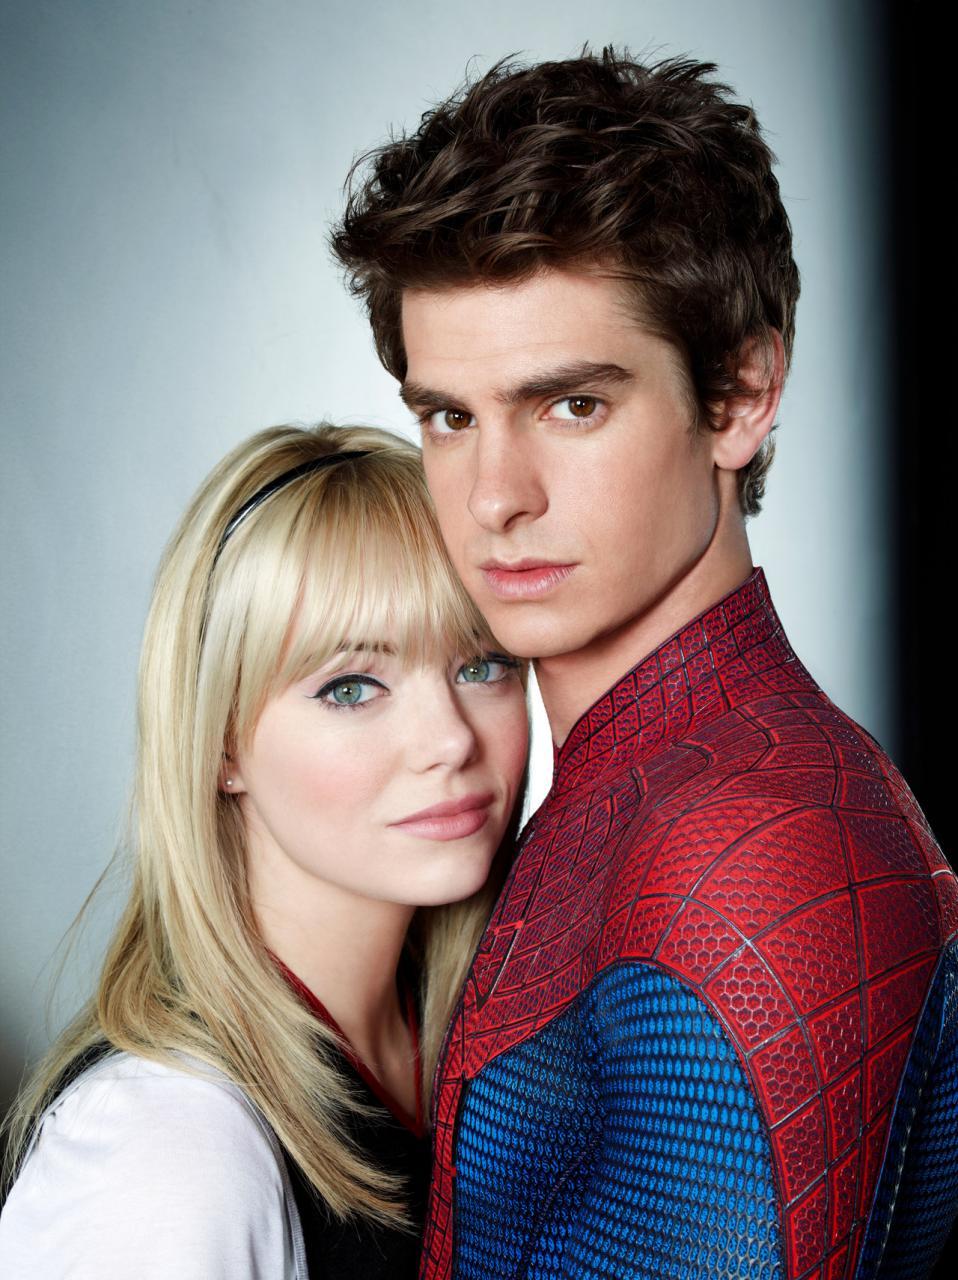 http://collider.com/wp-content/uploads/amazing-spider-man-andrew-garfield-emma-stone-hi-res-01.jpg